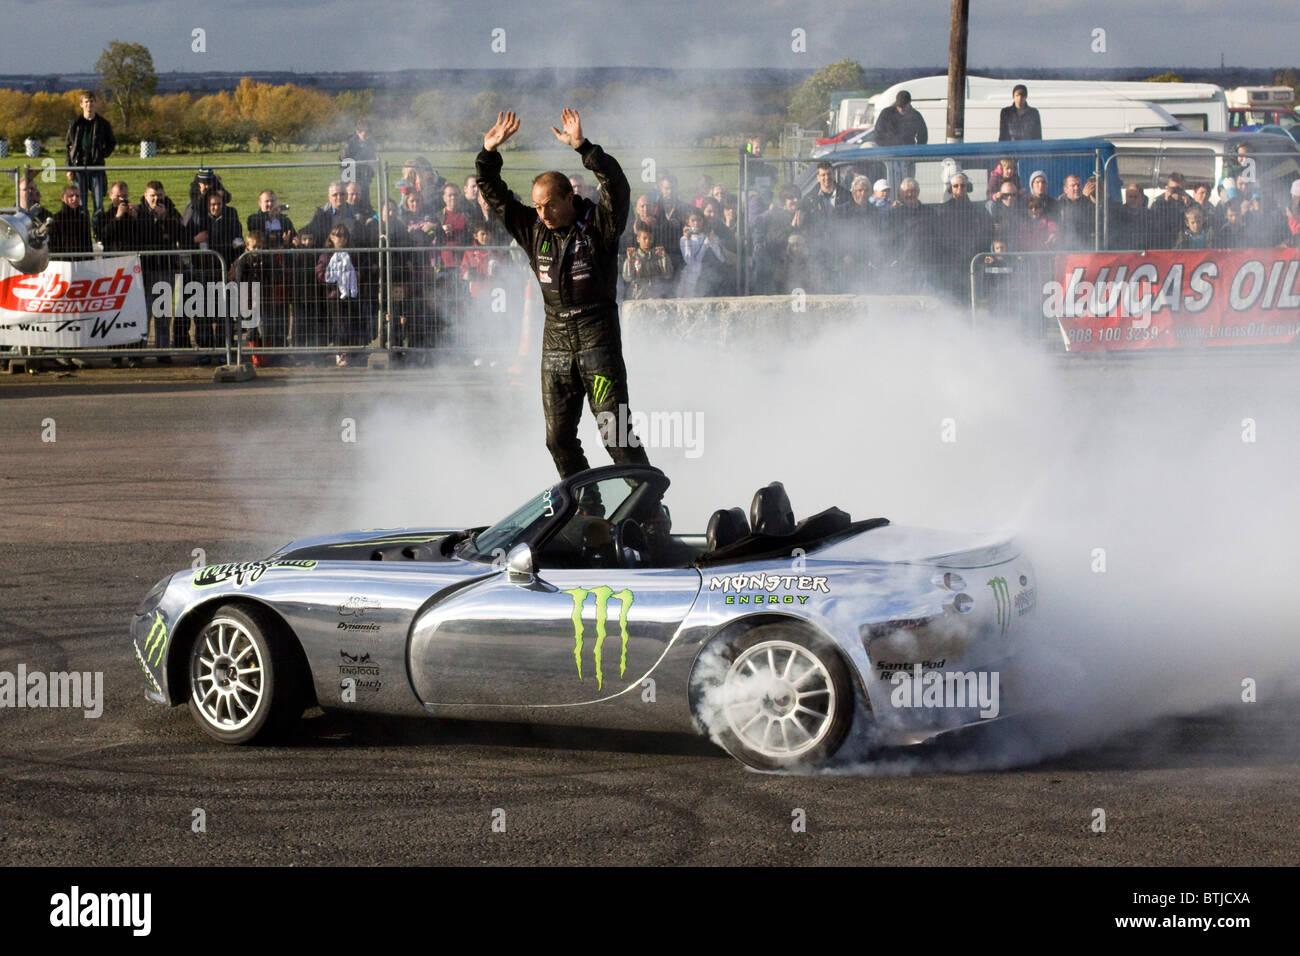 A Stunt man entertaining the crowd at Santa Pod Raceway England - Stock Image